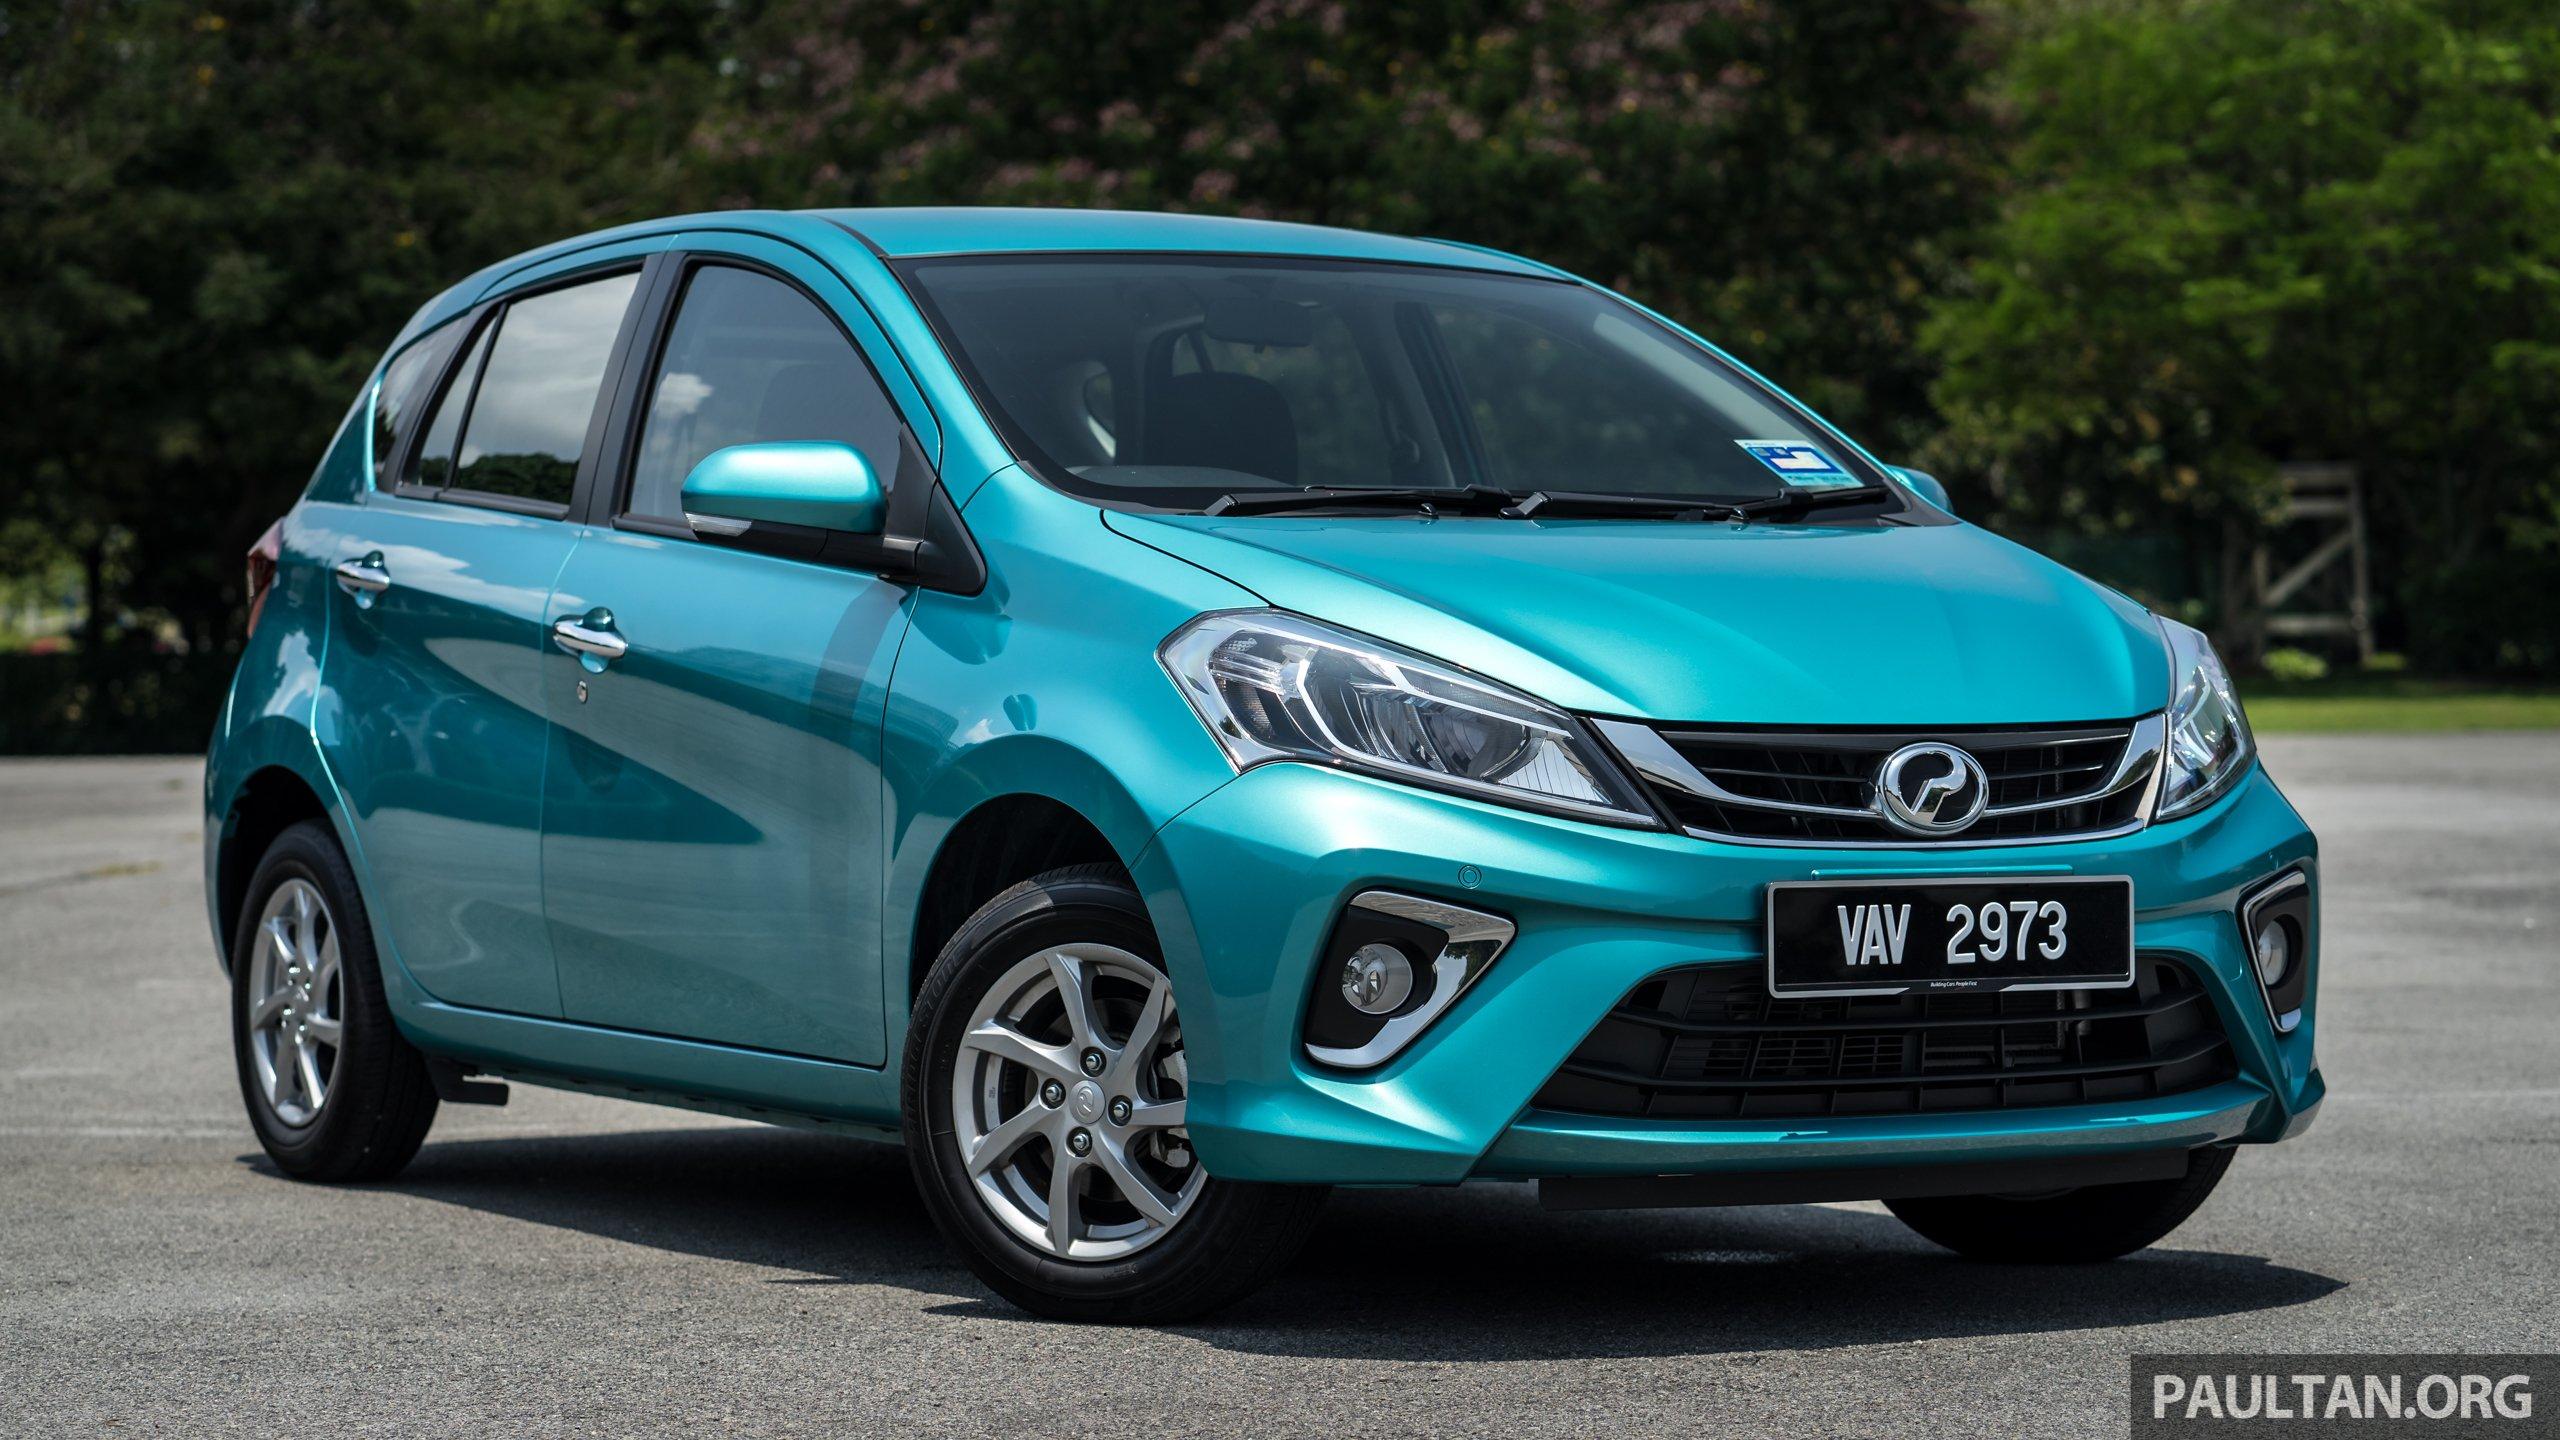 Perodua Myvi 2018 terjual 38k setakat ini - 70k tempahan